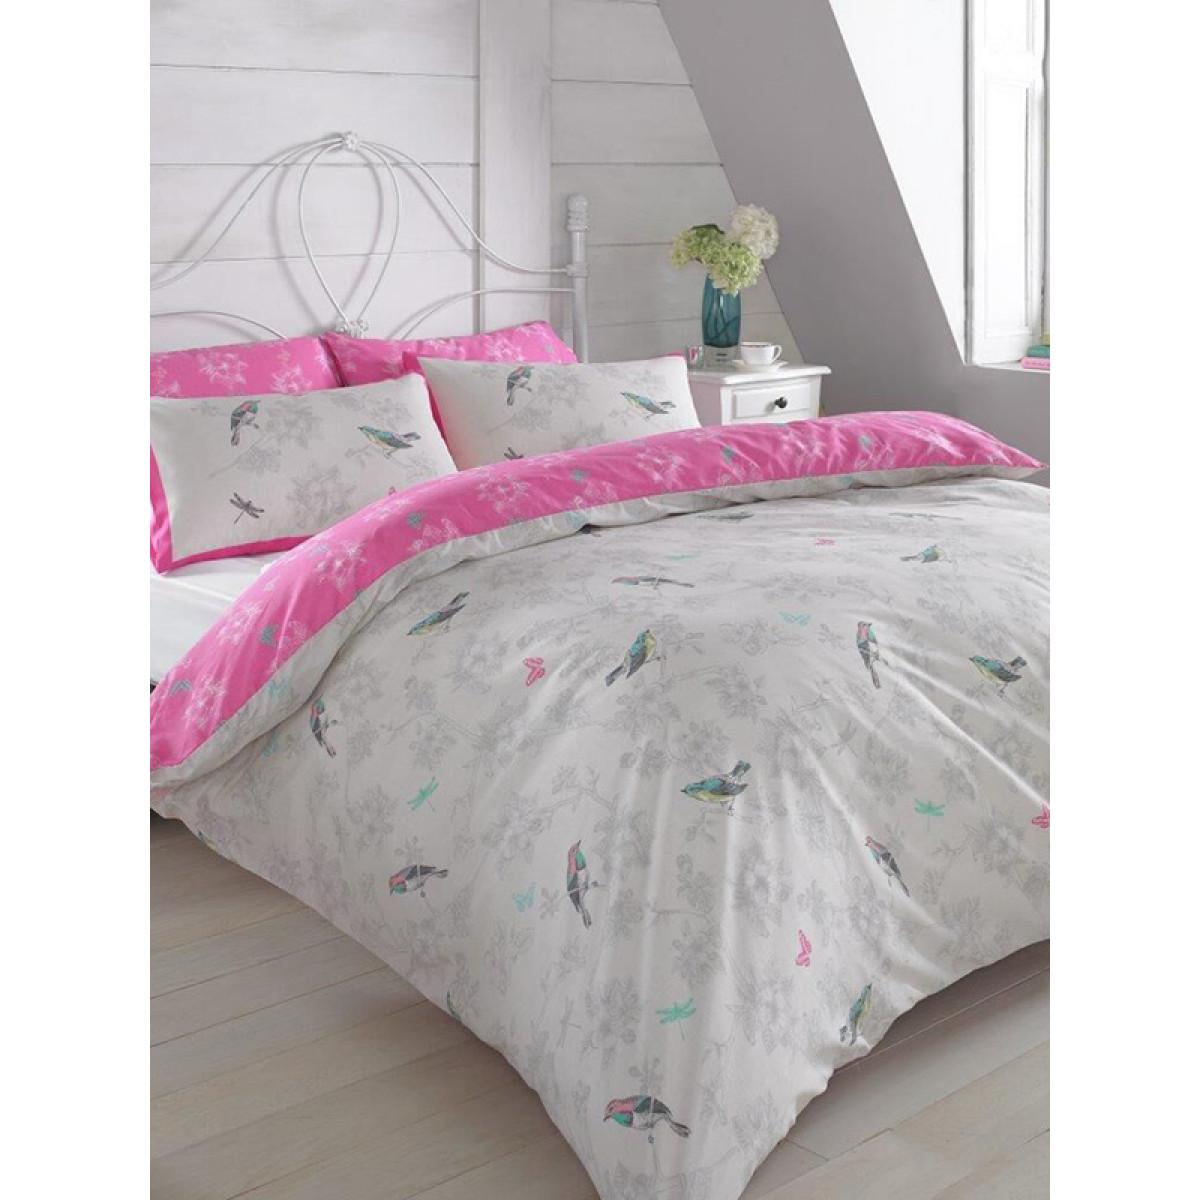 Vintage birds pink king size duvet cover and pillowcase set bedding